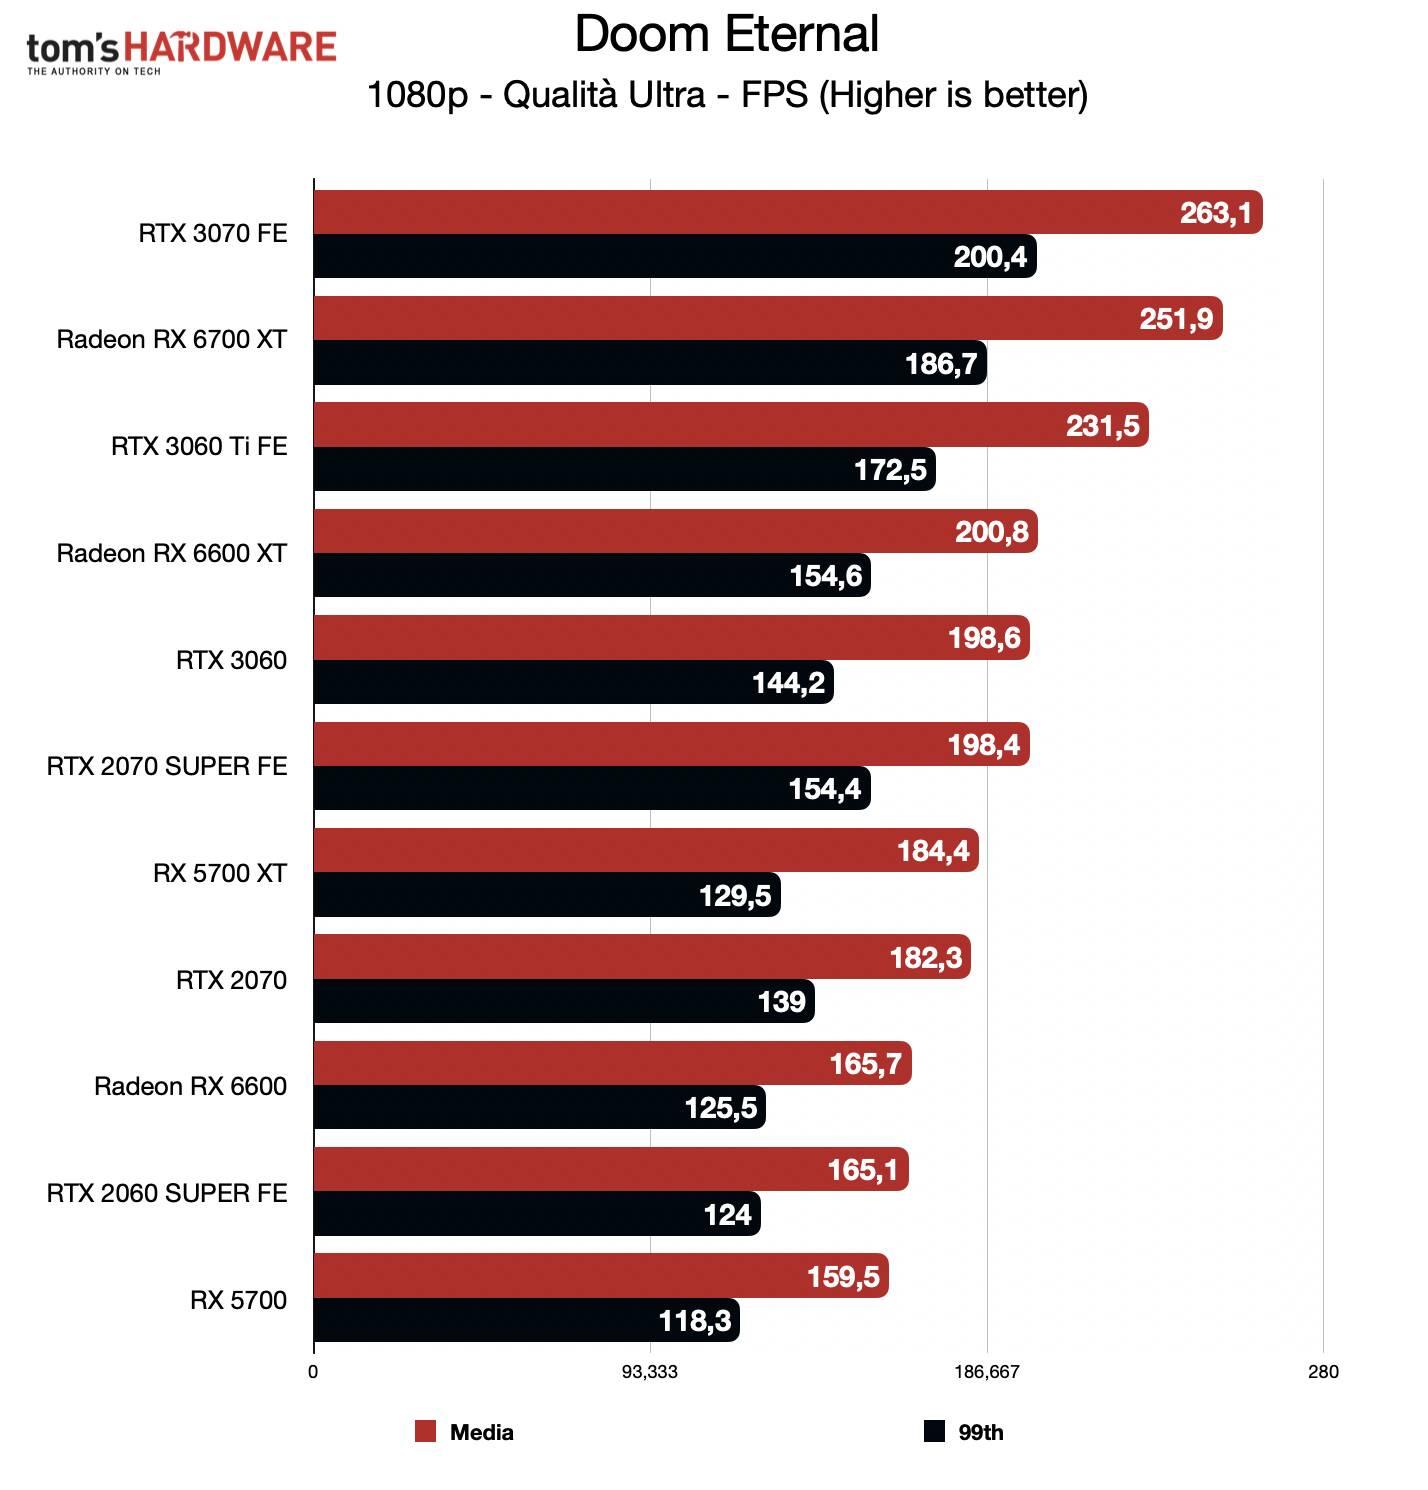 Benchmark Radeon RX 6600 - FHD - Doom Eternal